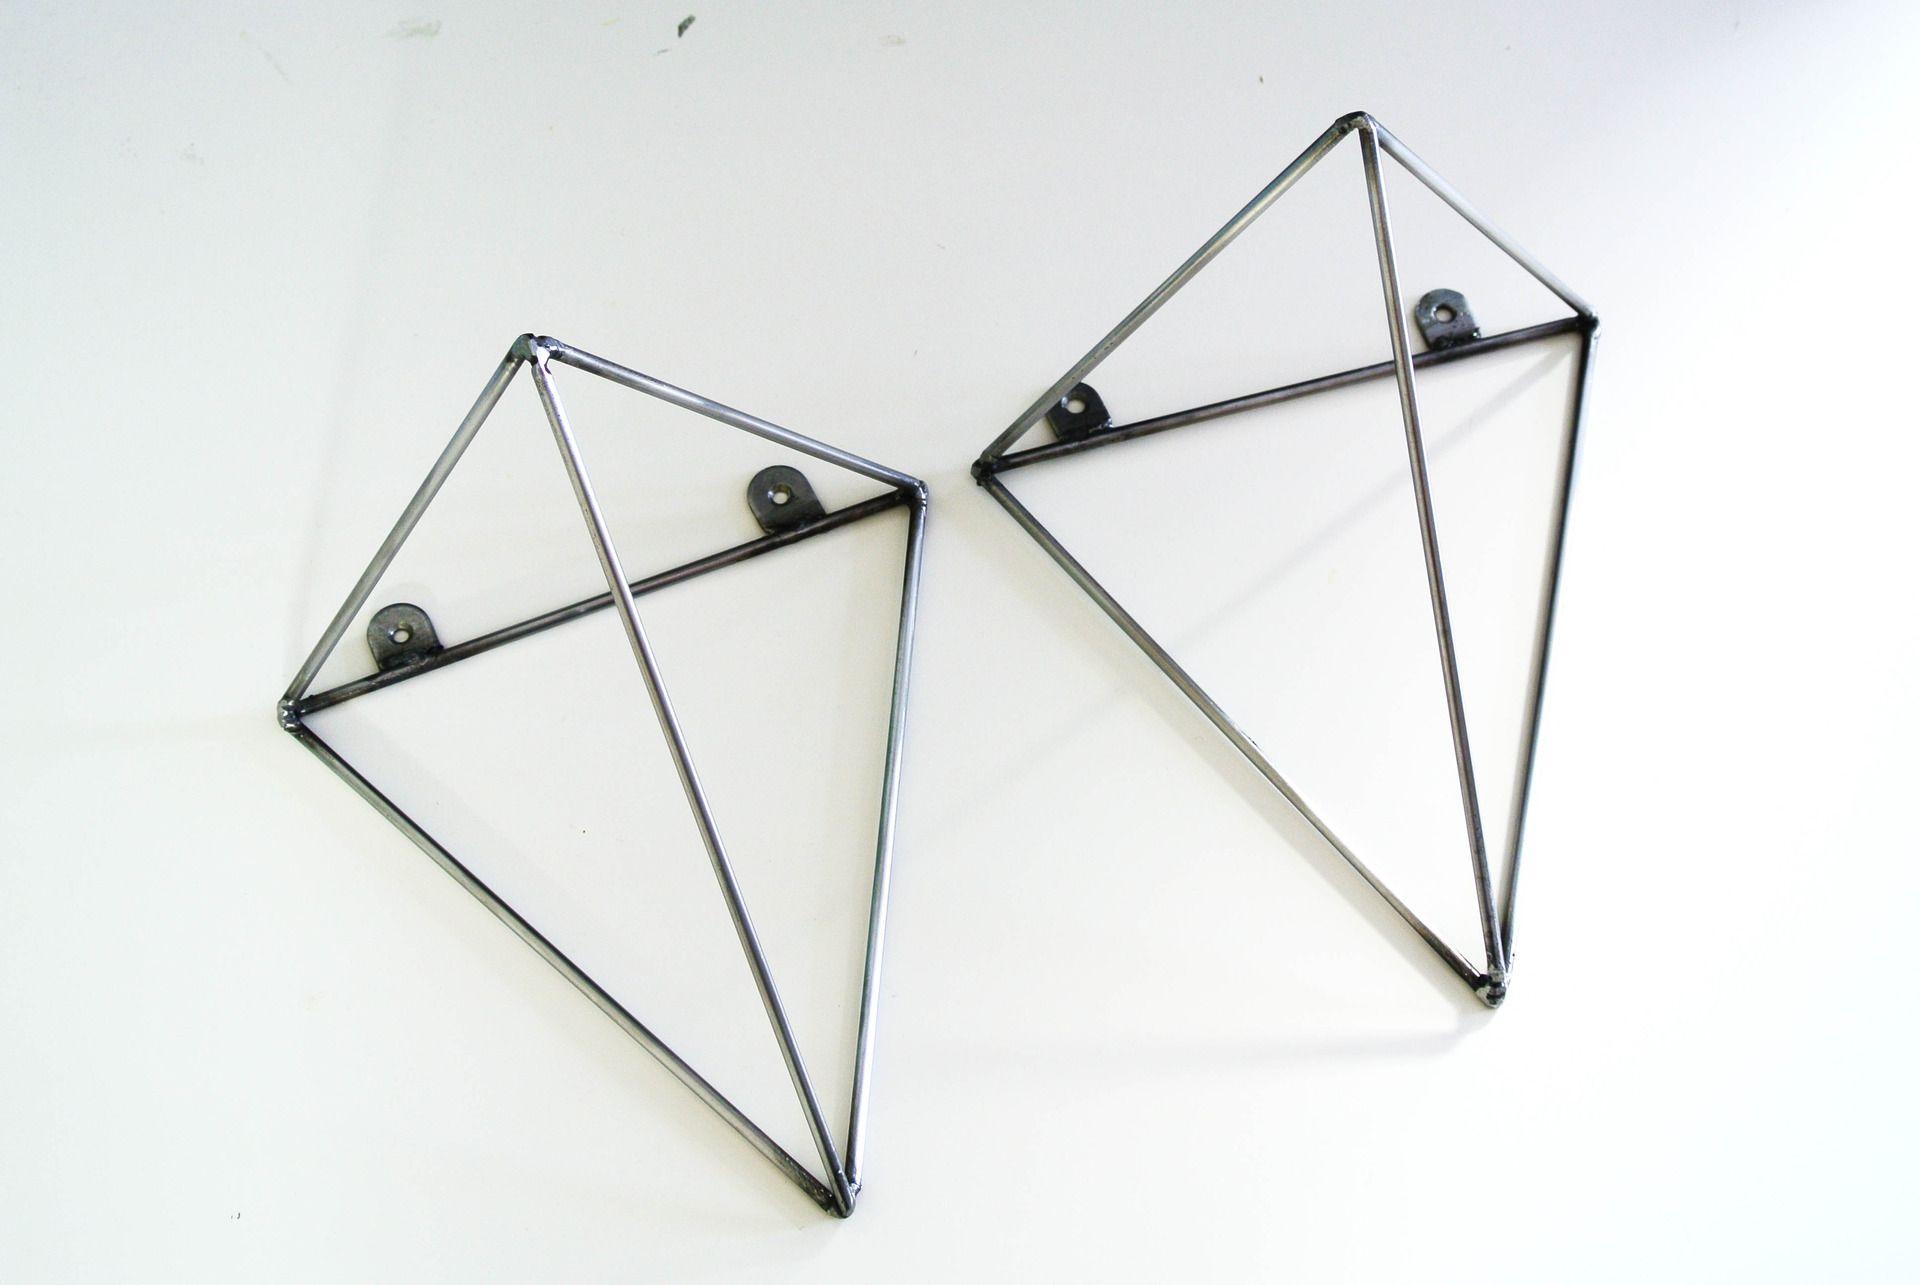 Paire de fixations g om trique bf 01 brut metal en for Muebles industriales metal baratos